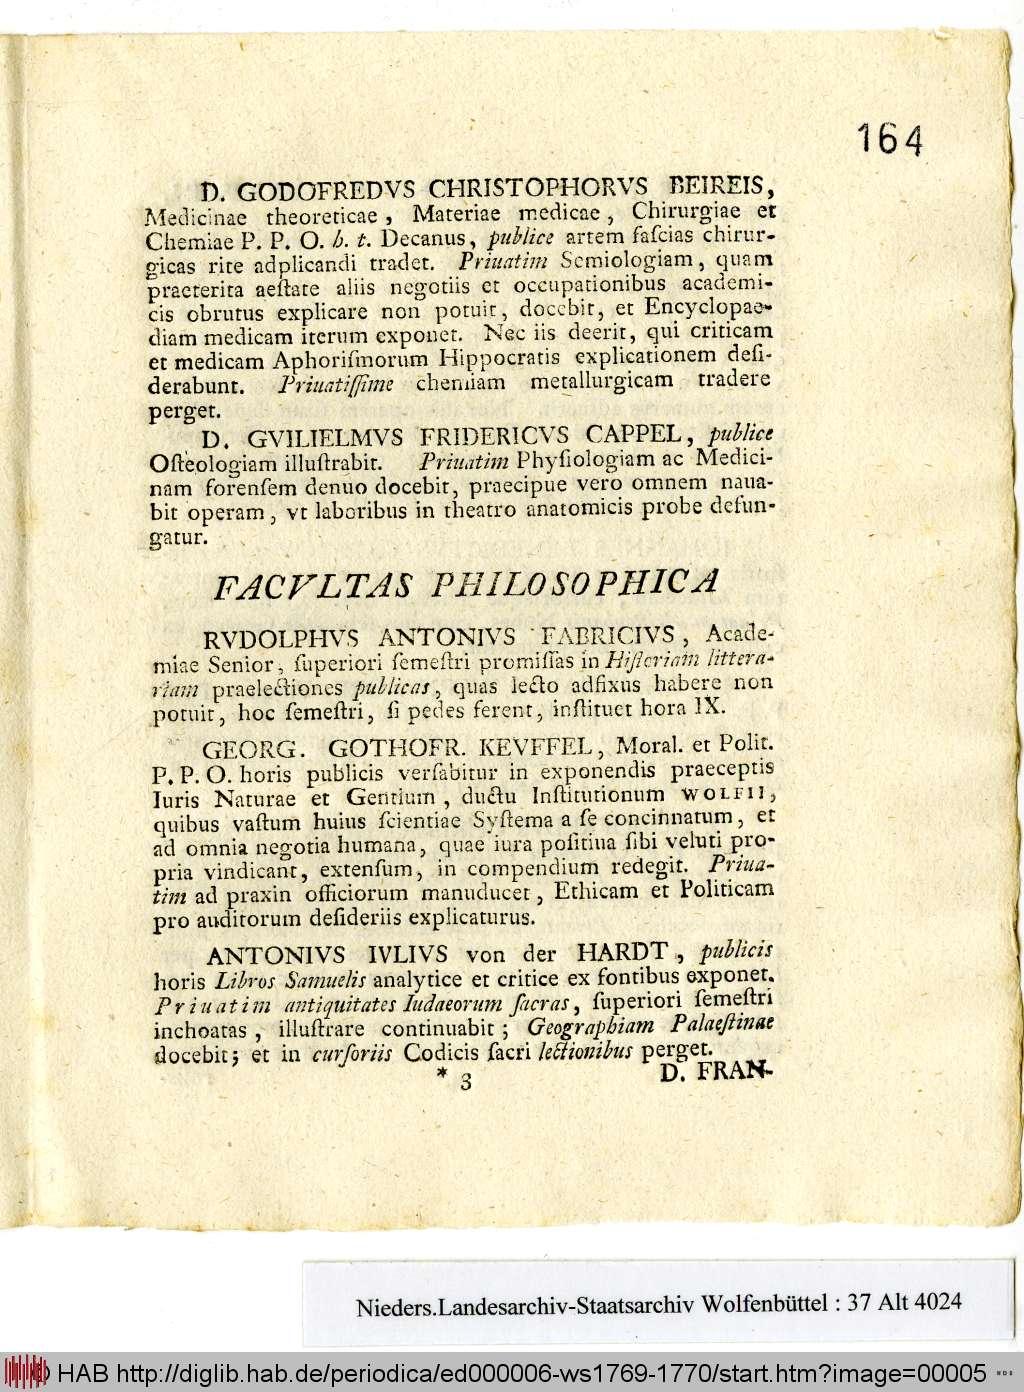 http://diglib.hab.de/periodica/ed000006-ws1769-1770/00005.jpg